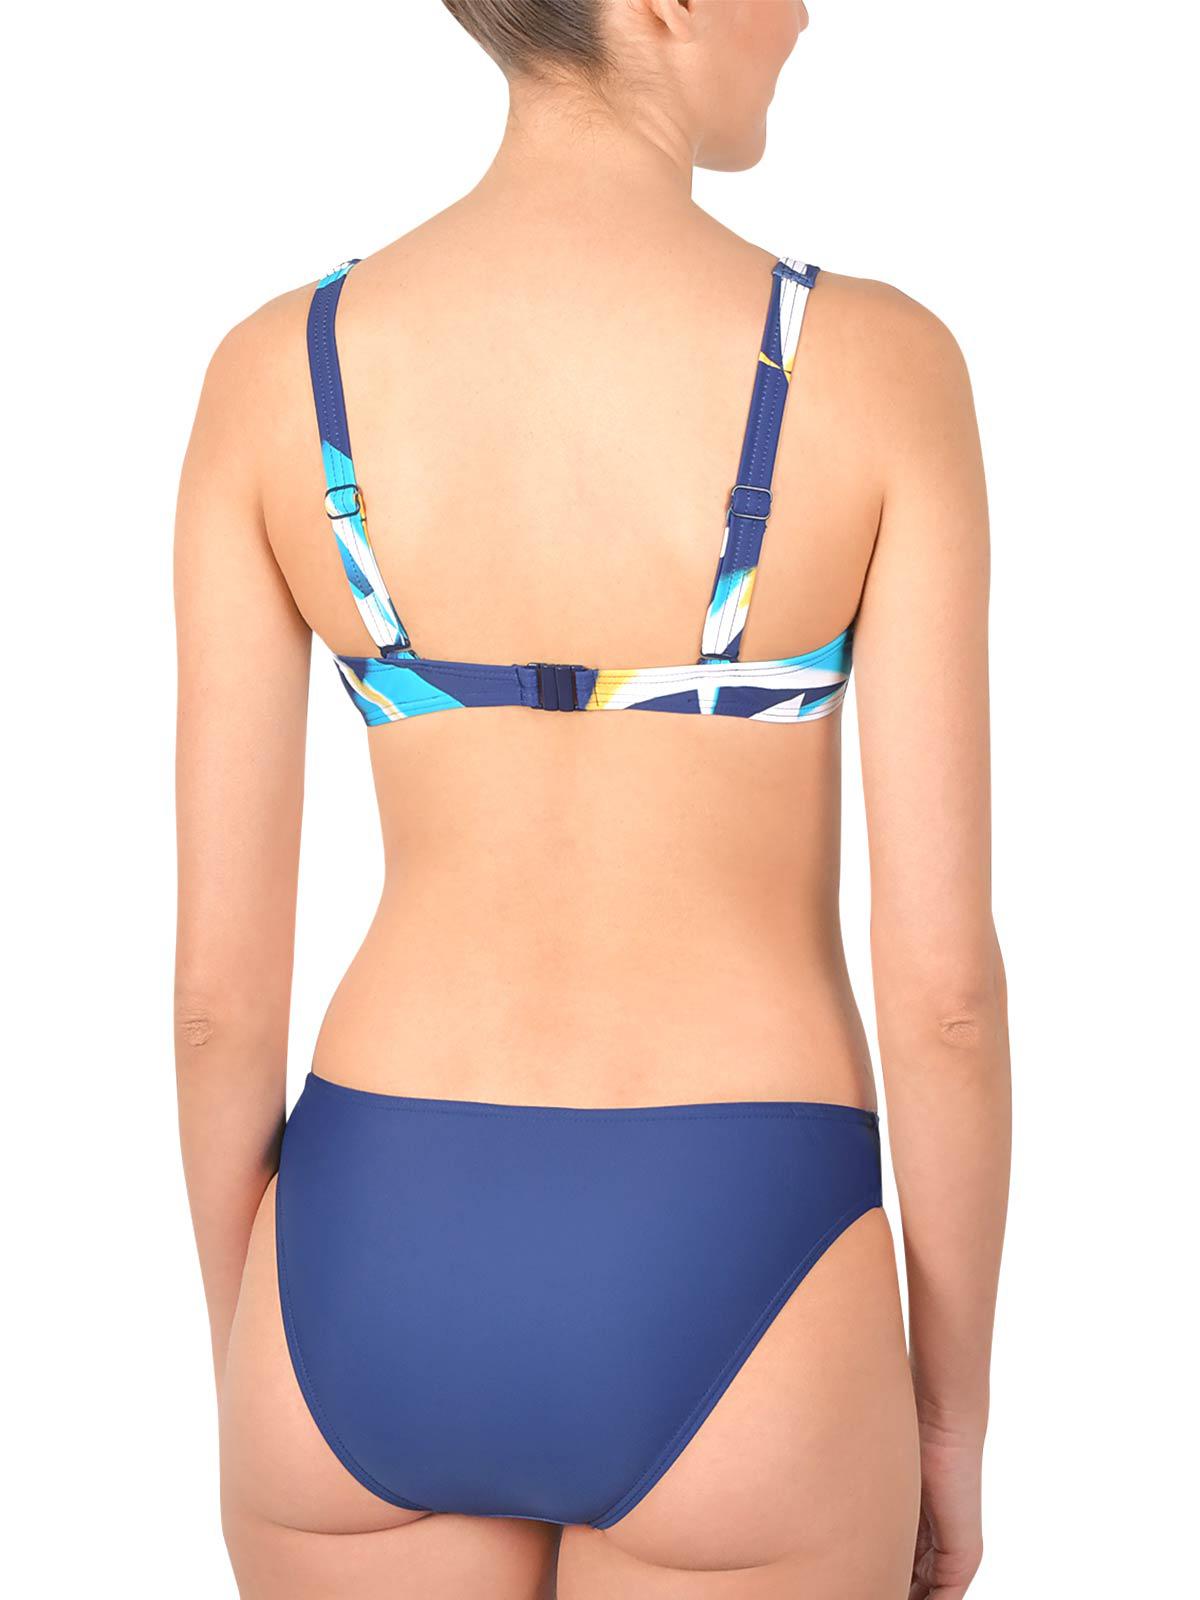 NATURANA Bügel-Bikini 72505 Gr. 36-46 B-D